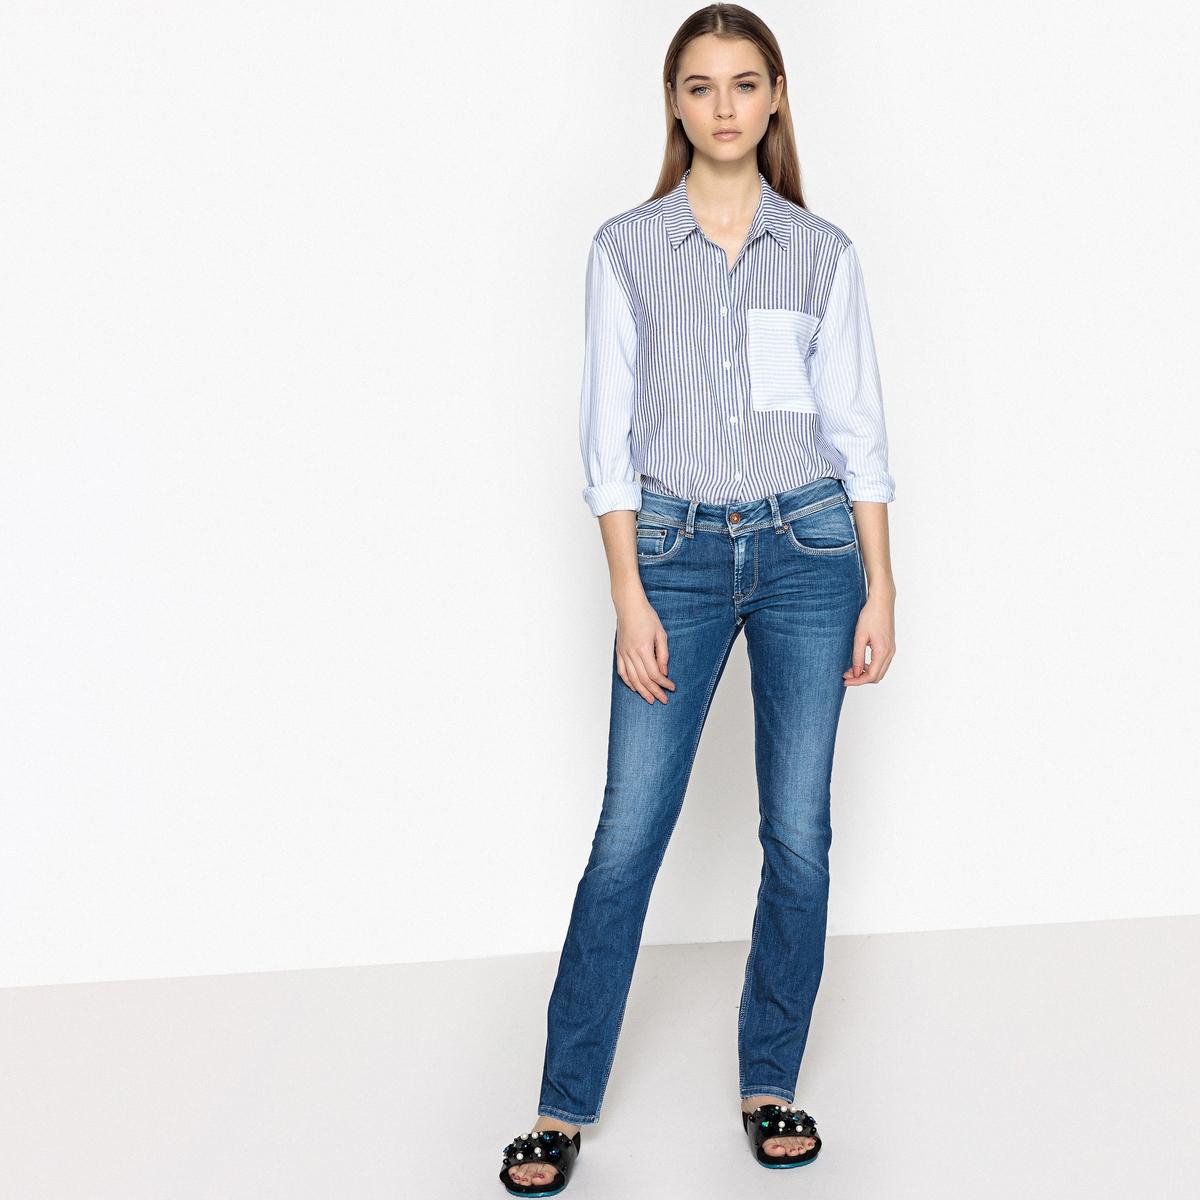 Imagen secundaria de producto de Camisa recta con cuello camisero de manga larga - Pepe Jeans